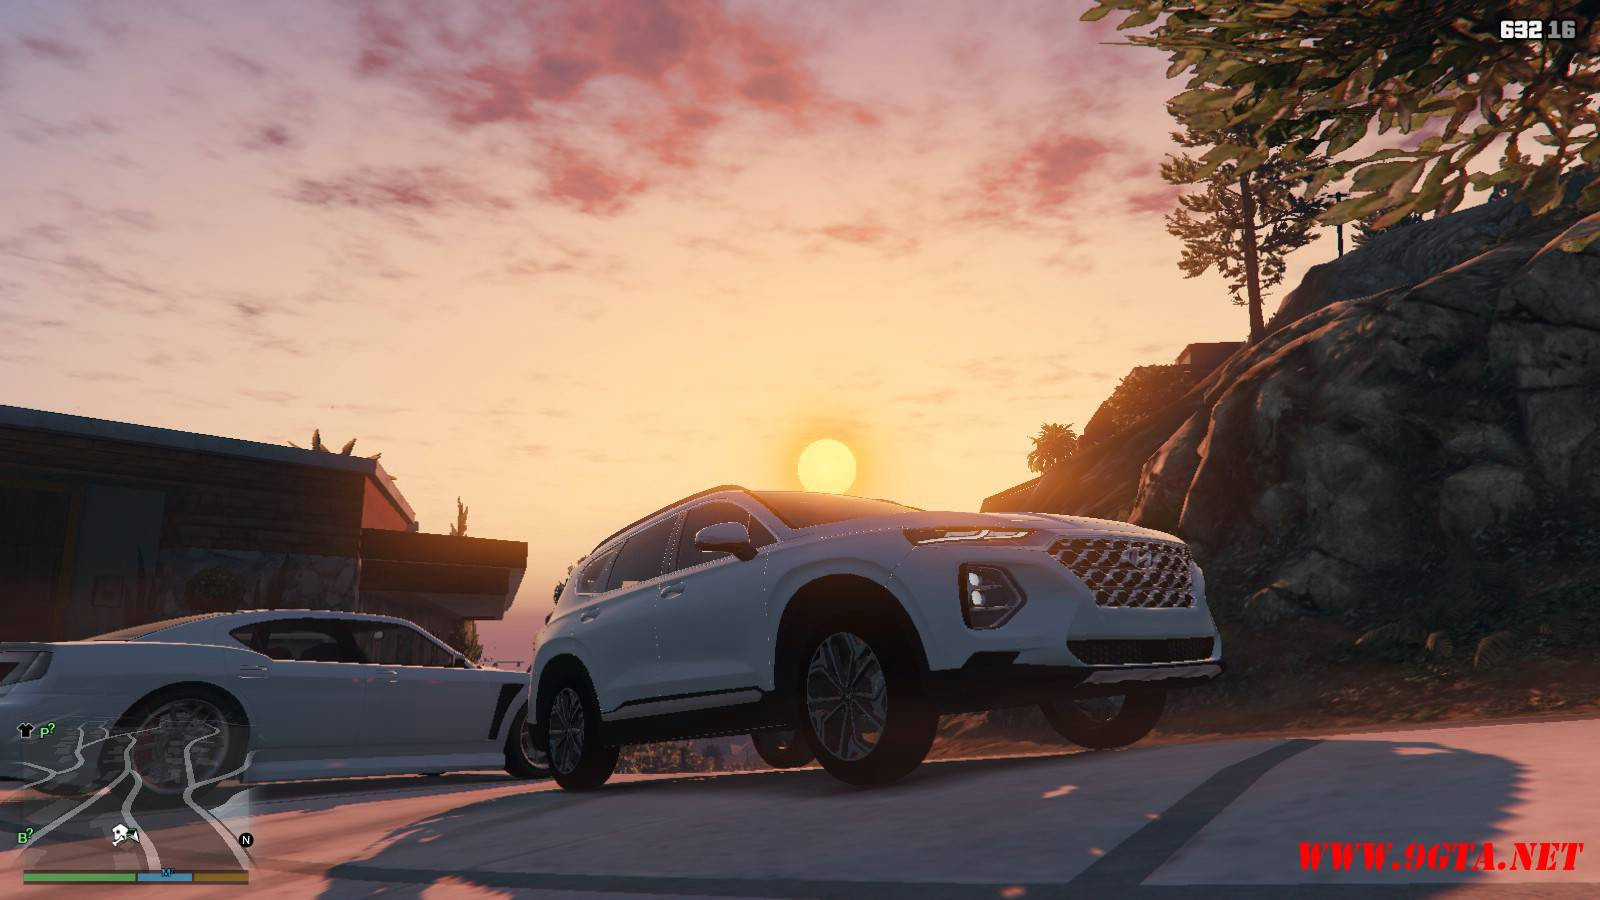 2019 Huyndai Santa Fe GTA5 mods (8)